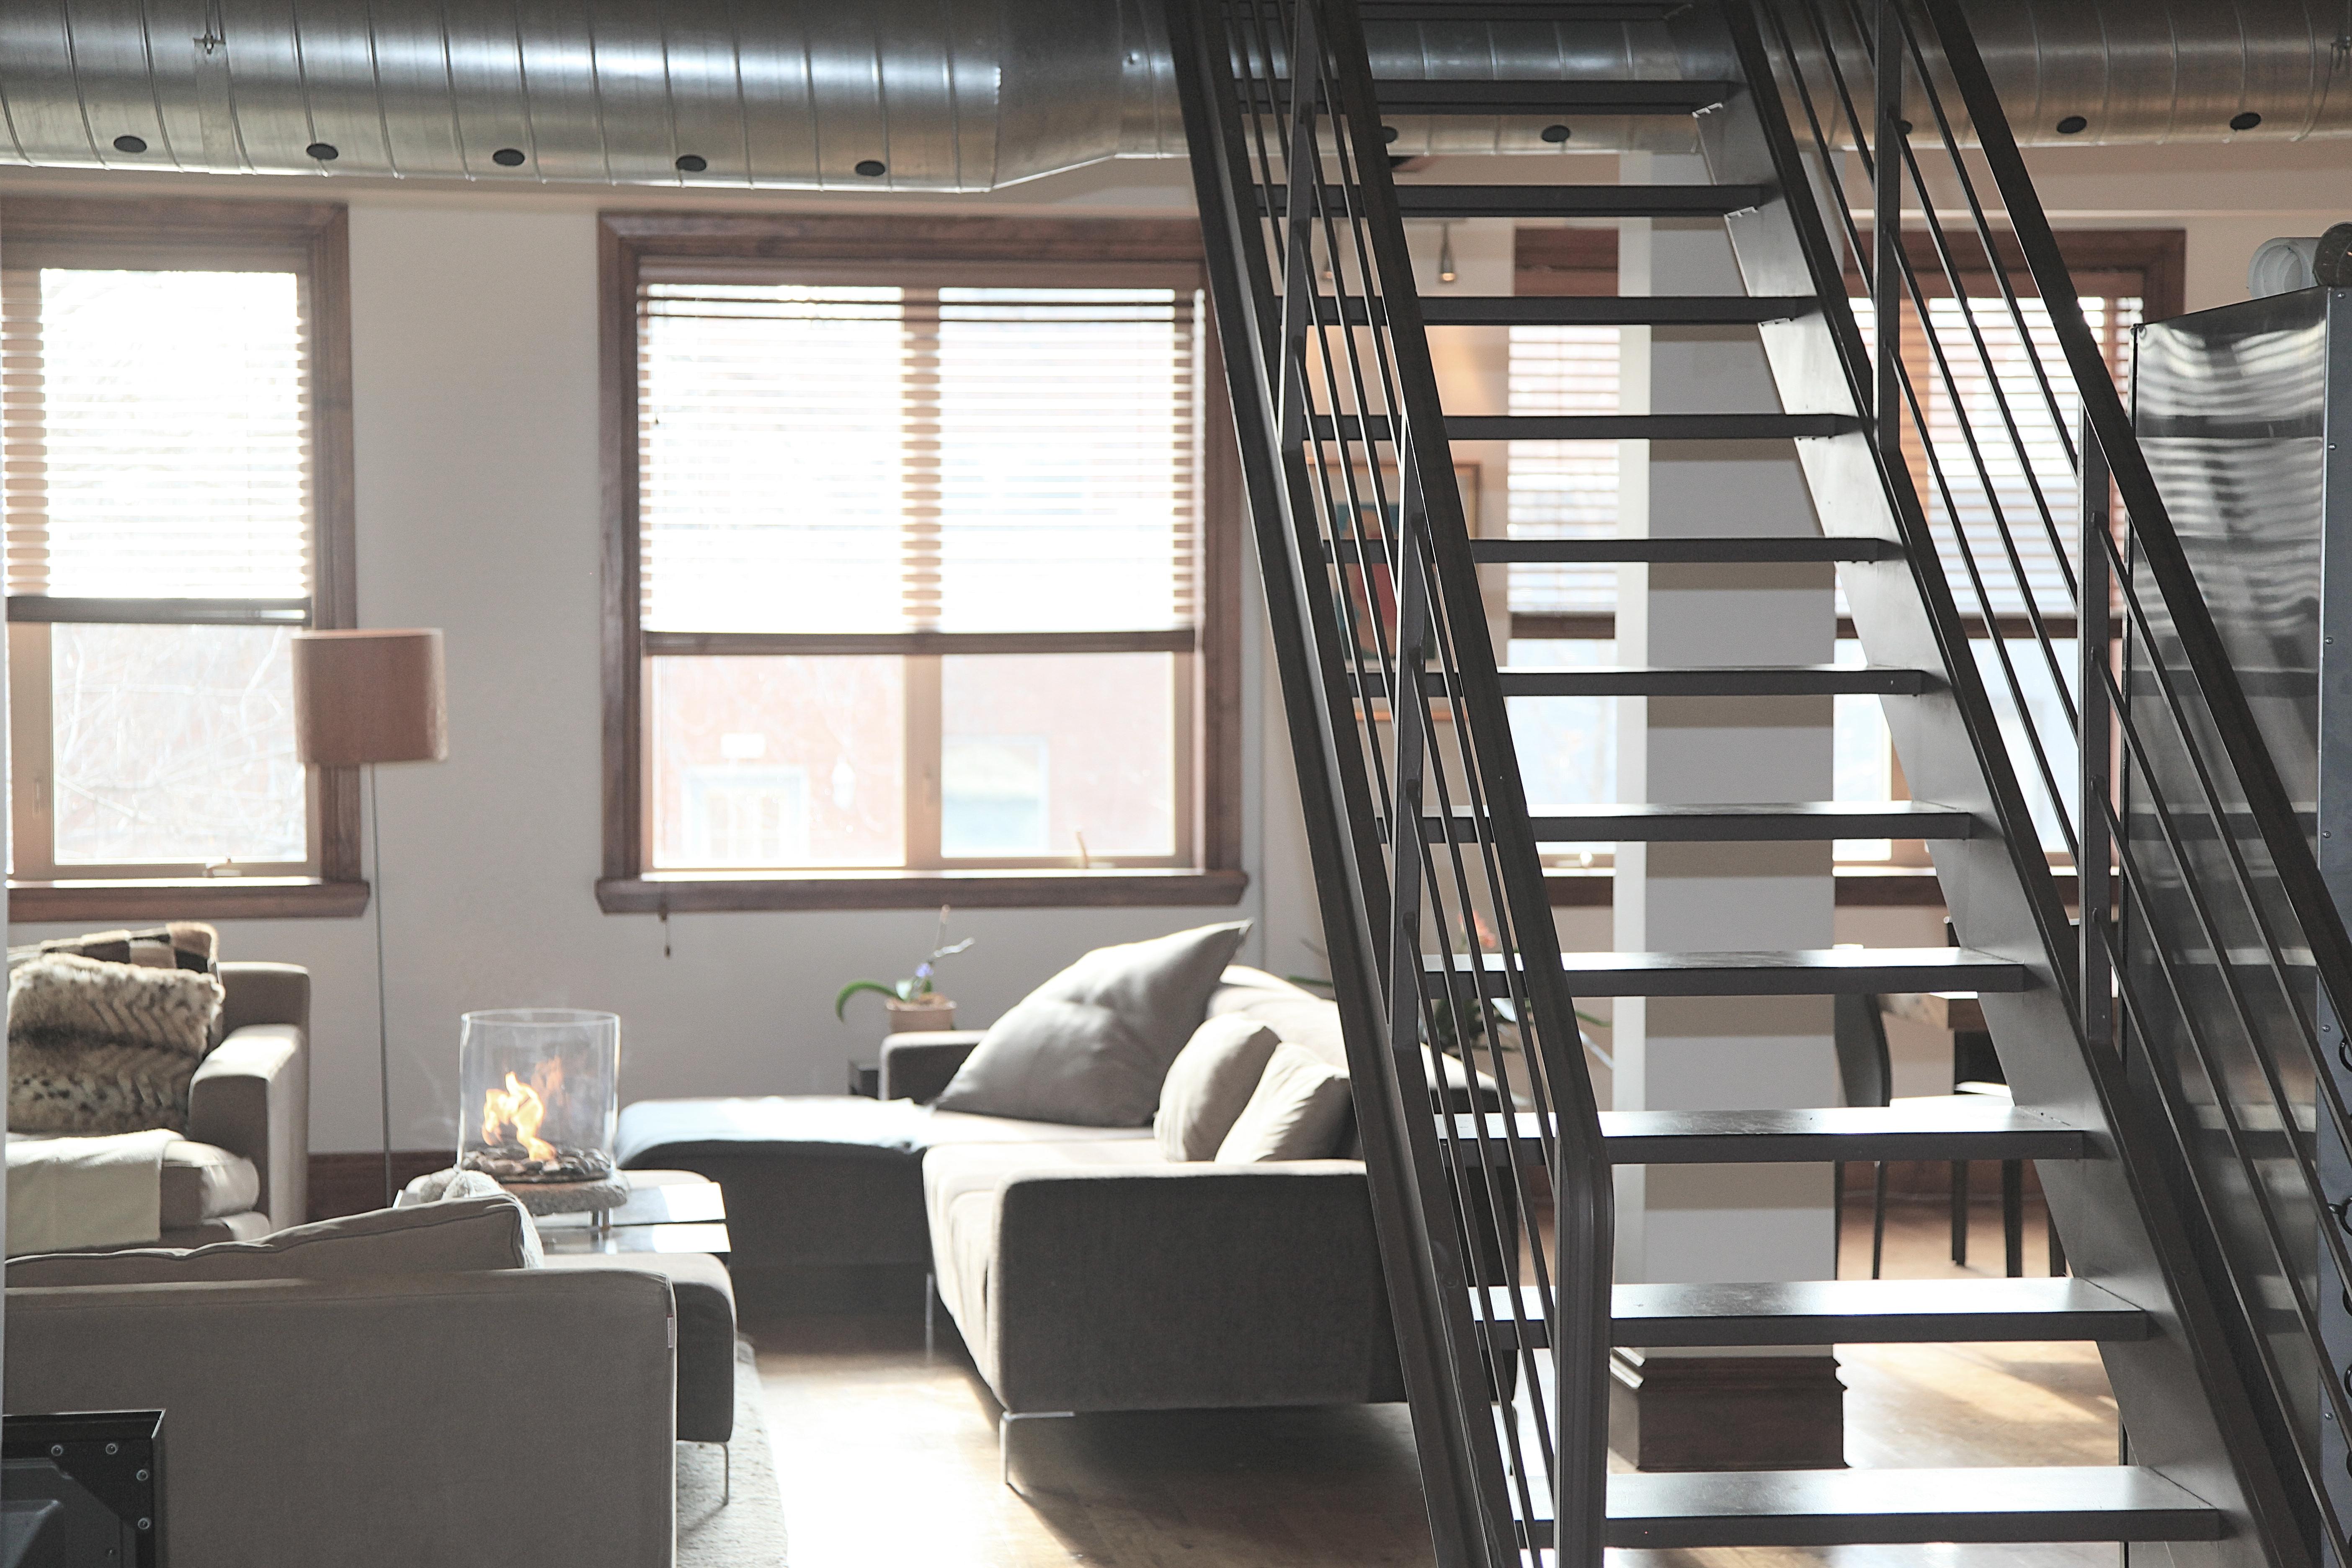 condominio bonus casa 2019 approfondimento avvocatoflash